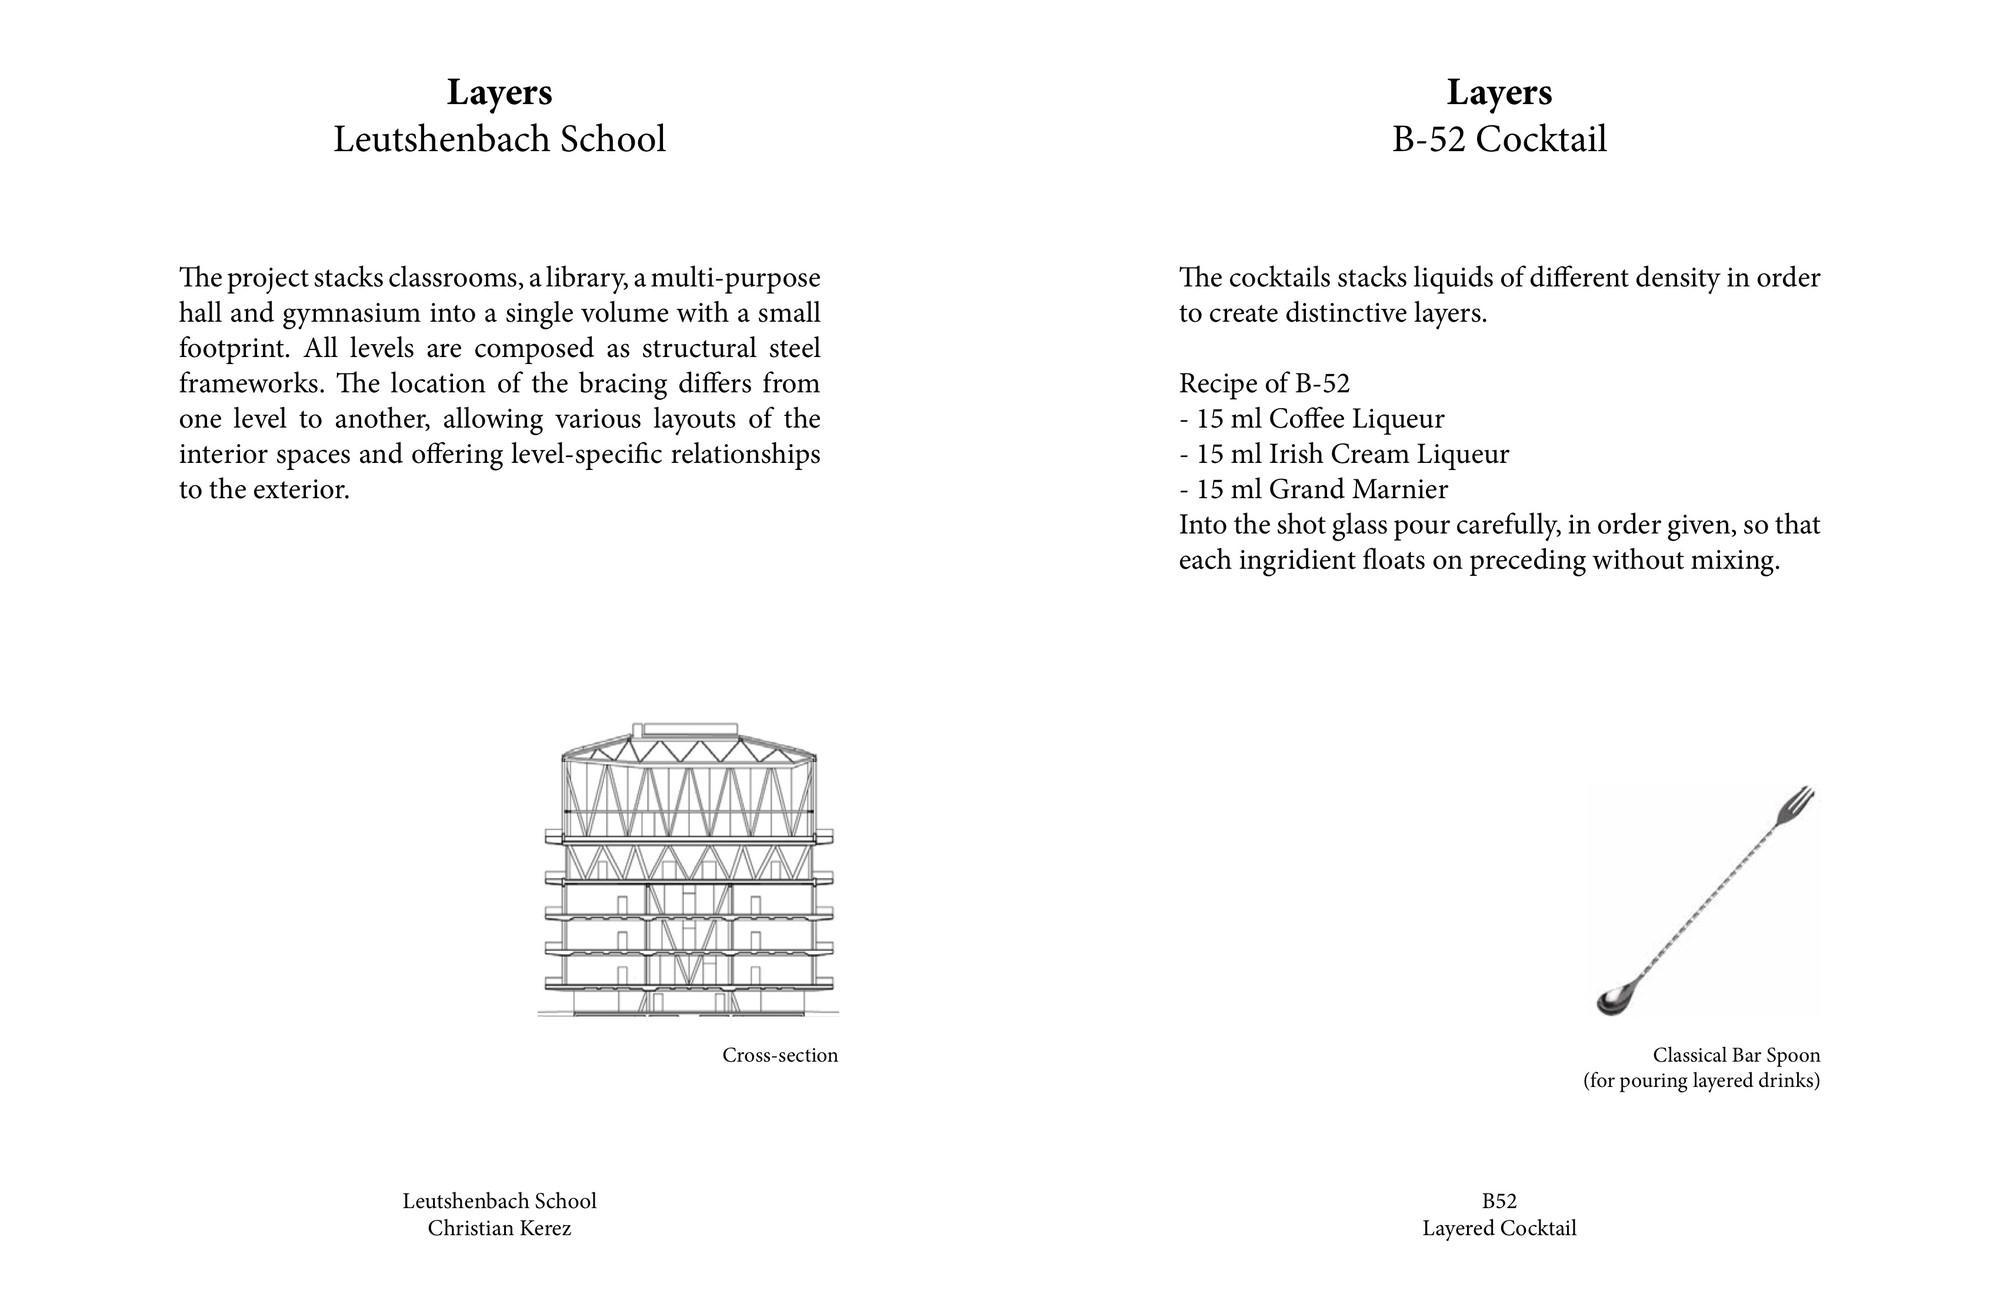 Colegio Leutschenbach por Christian Kerez / B52. Imágen cortesía de Kosmos Architects